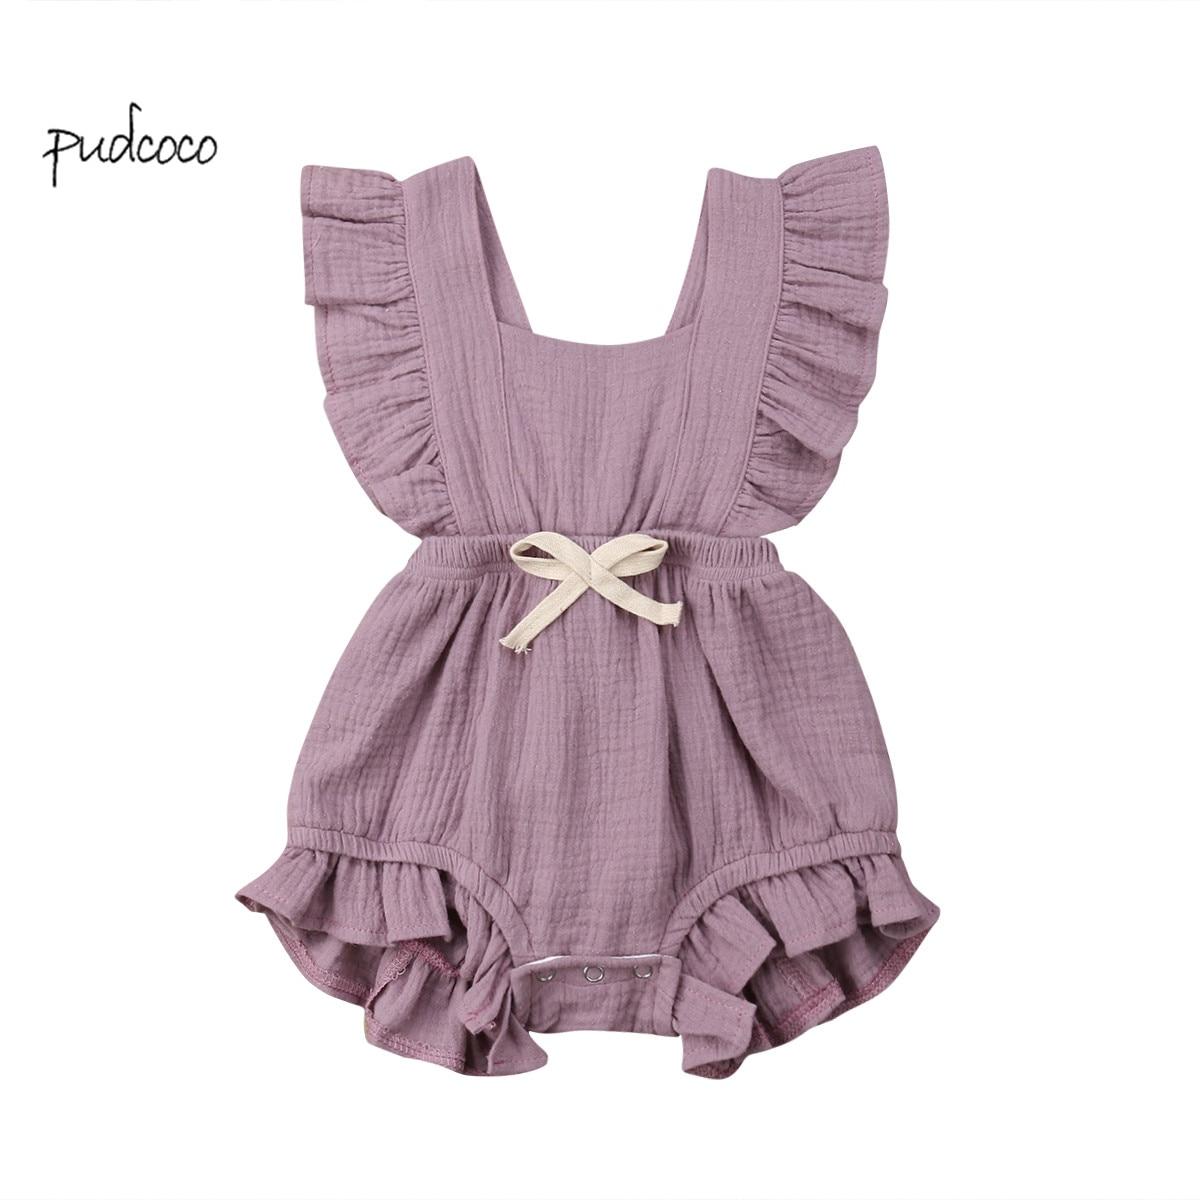 Pudcoco New Brand Newborn Baby Girls Ruffle  Solid Sleeveless Bodysuit Outfits Sunsuit